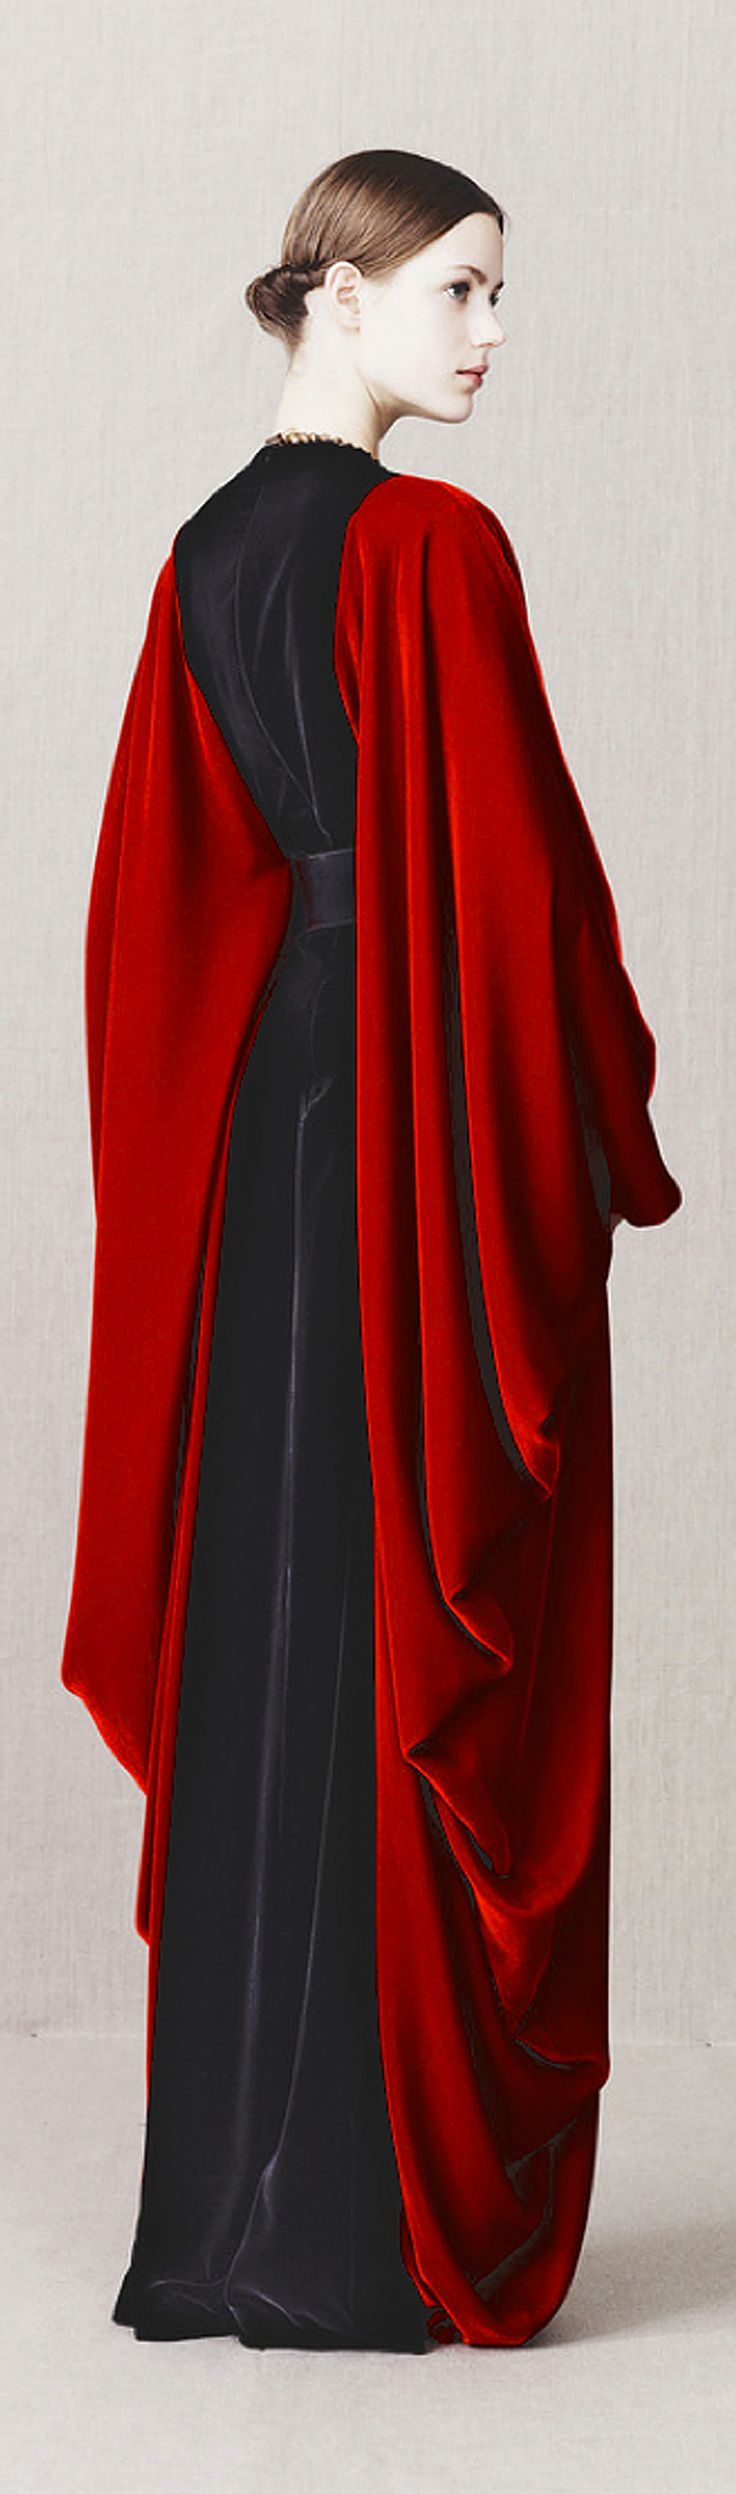 Alexander McQueen Pre-Fall 2013 -Très Haute Diva. V